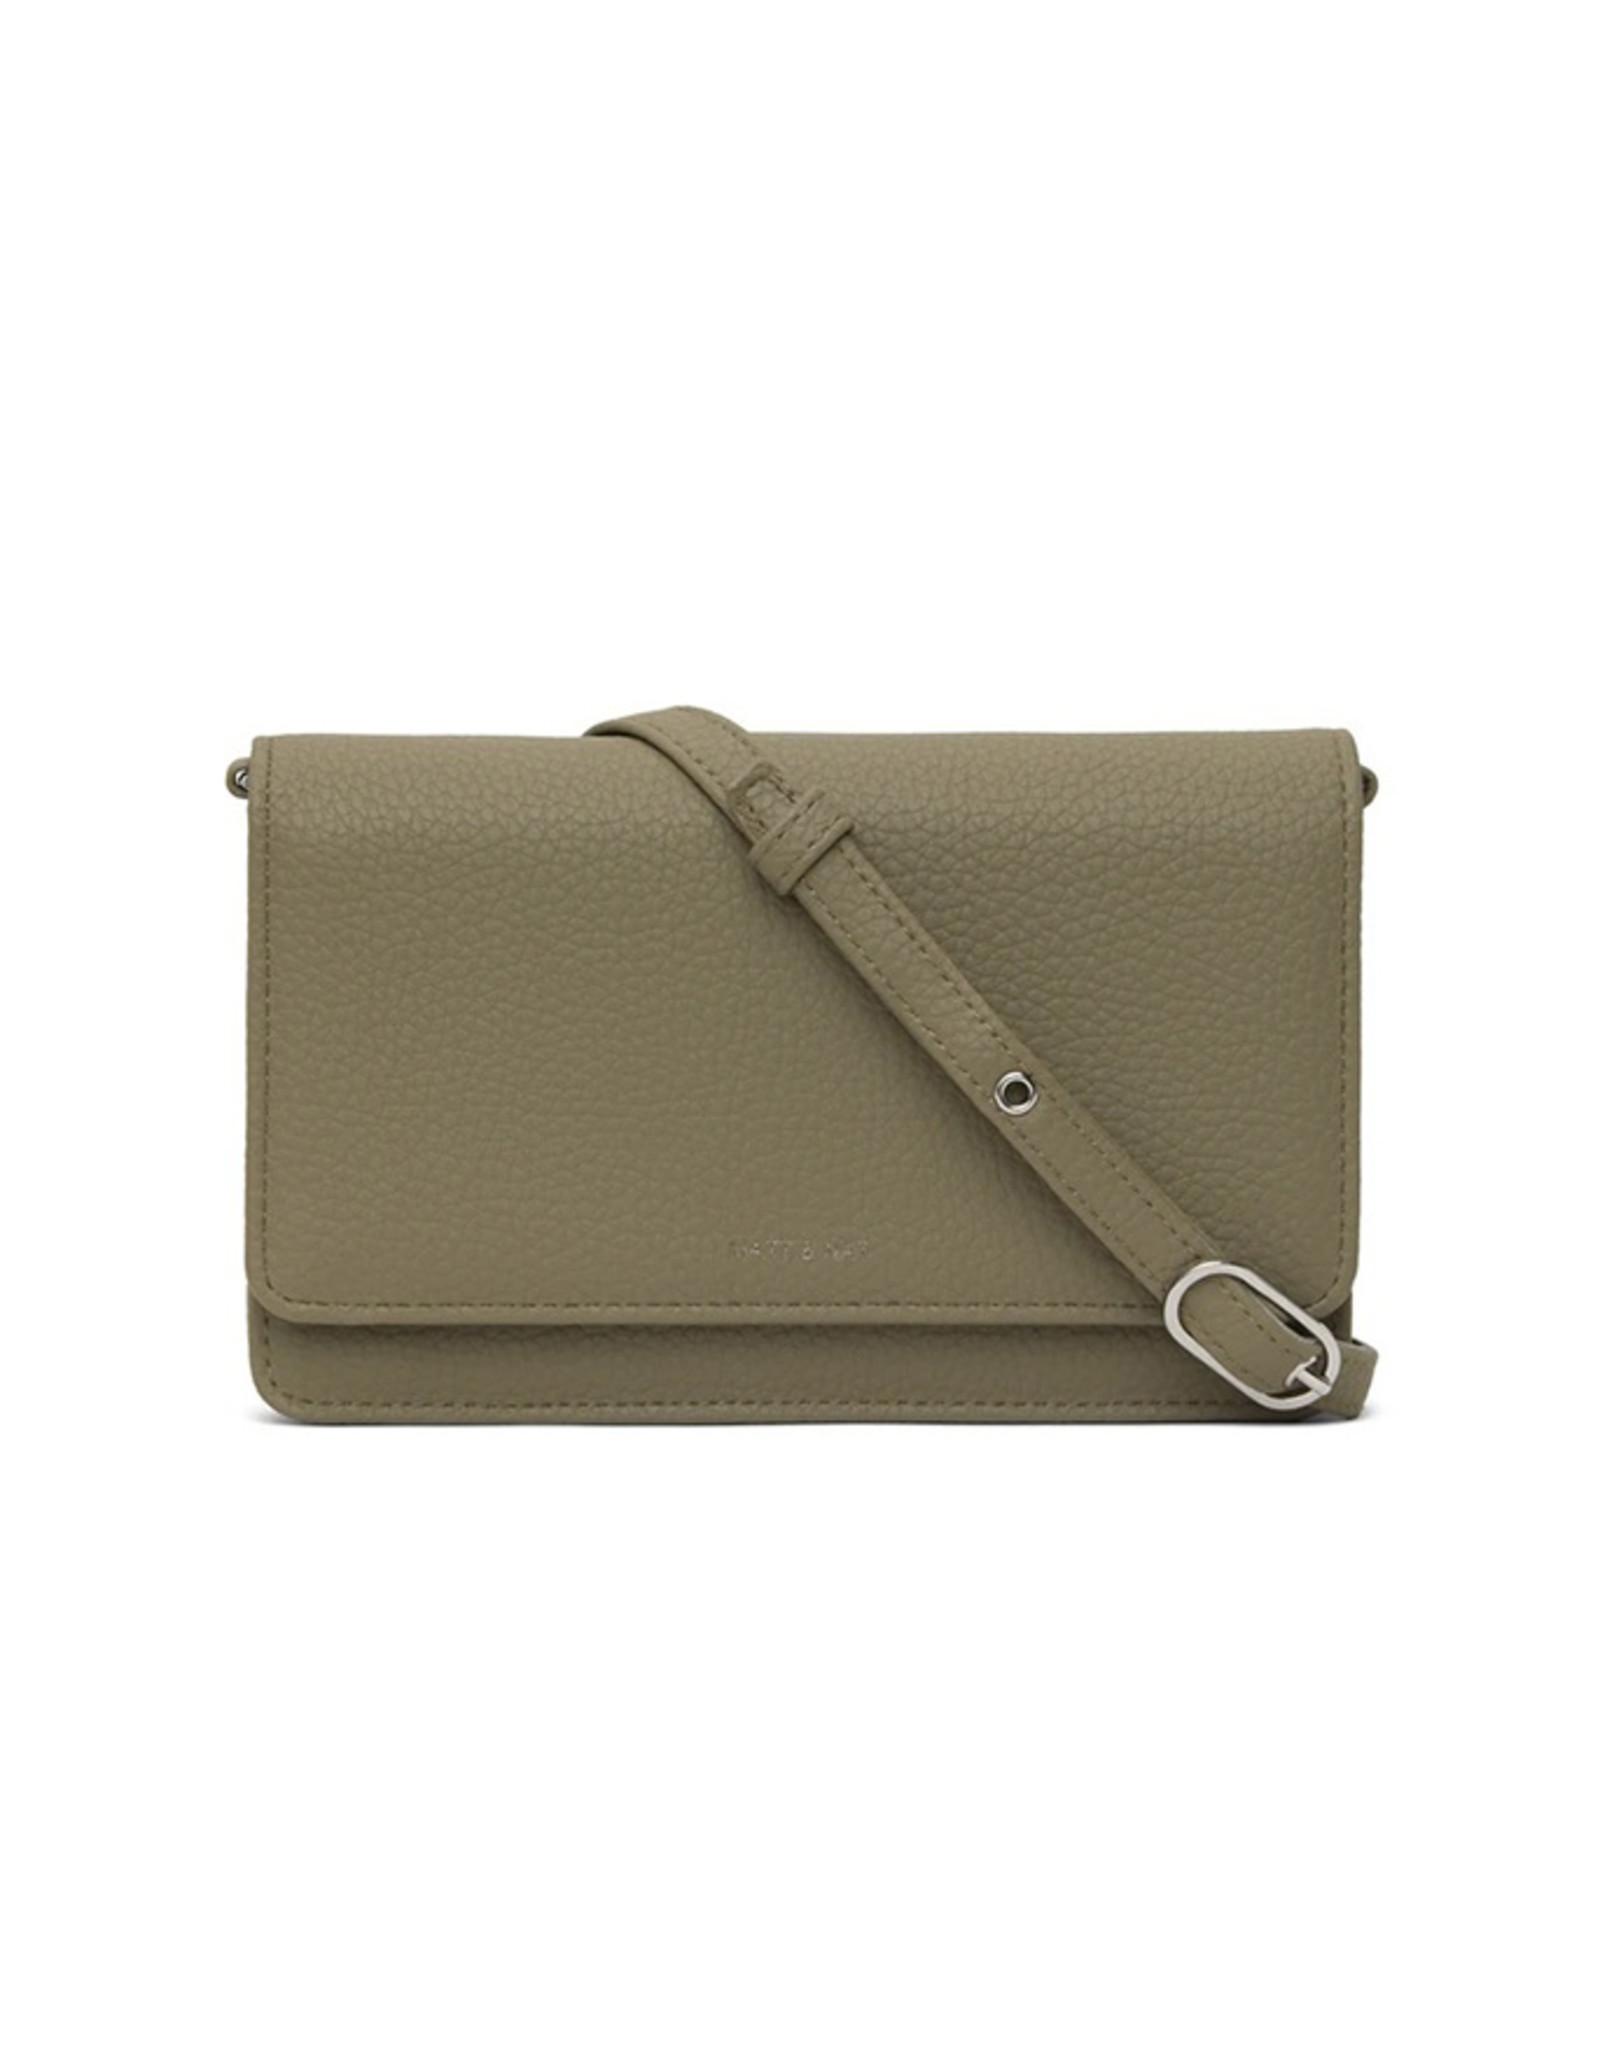 Bag Mineral Green